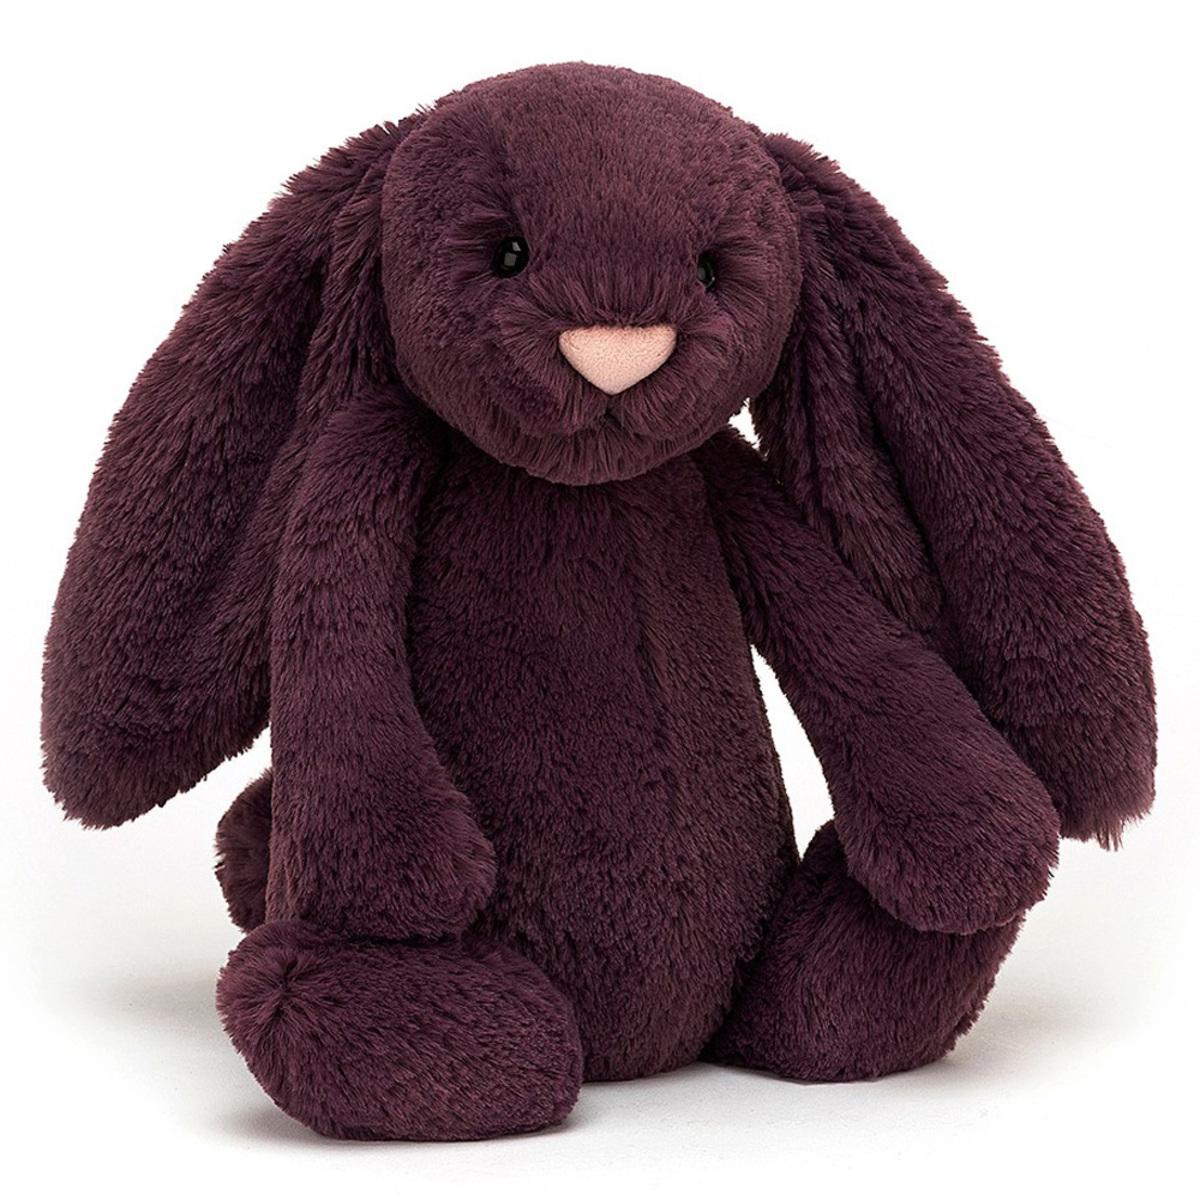 Peluche Bashful Plum Bunny - Medium Peluche Lapin 31 cm